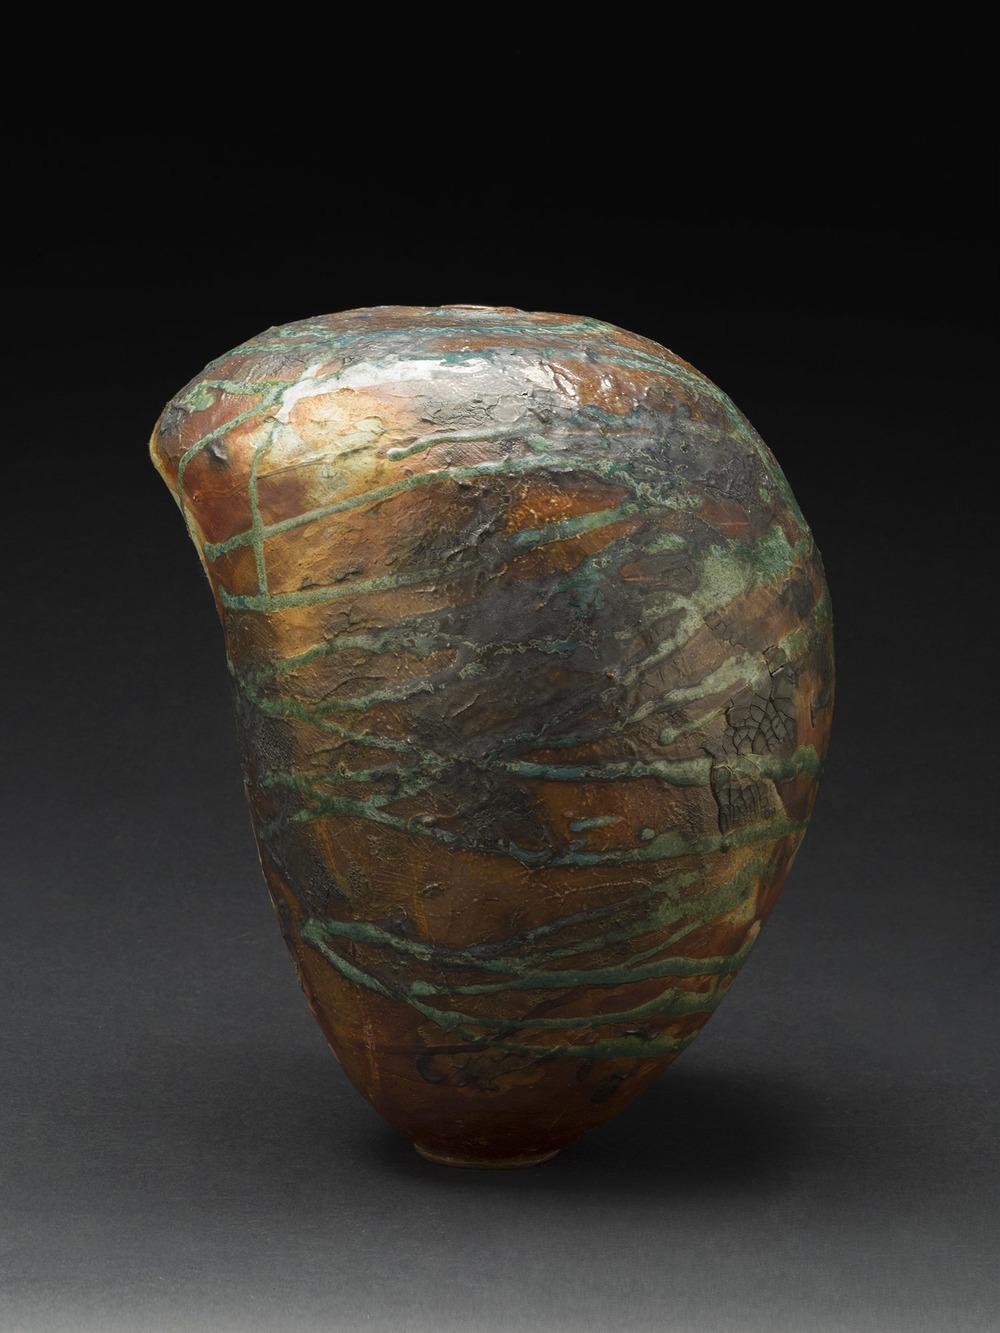 Melanie Ferguson    Below Bitter Springs Butte  , 2014 Handbuilt stoneware, soda fired 12 x 9.5 x 8.5 inches 30.5 x 24.1 x 21.6 cm MFe 17